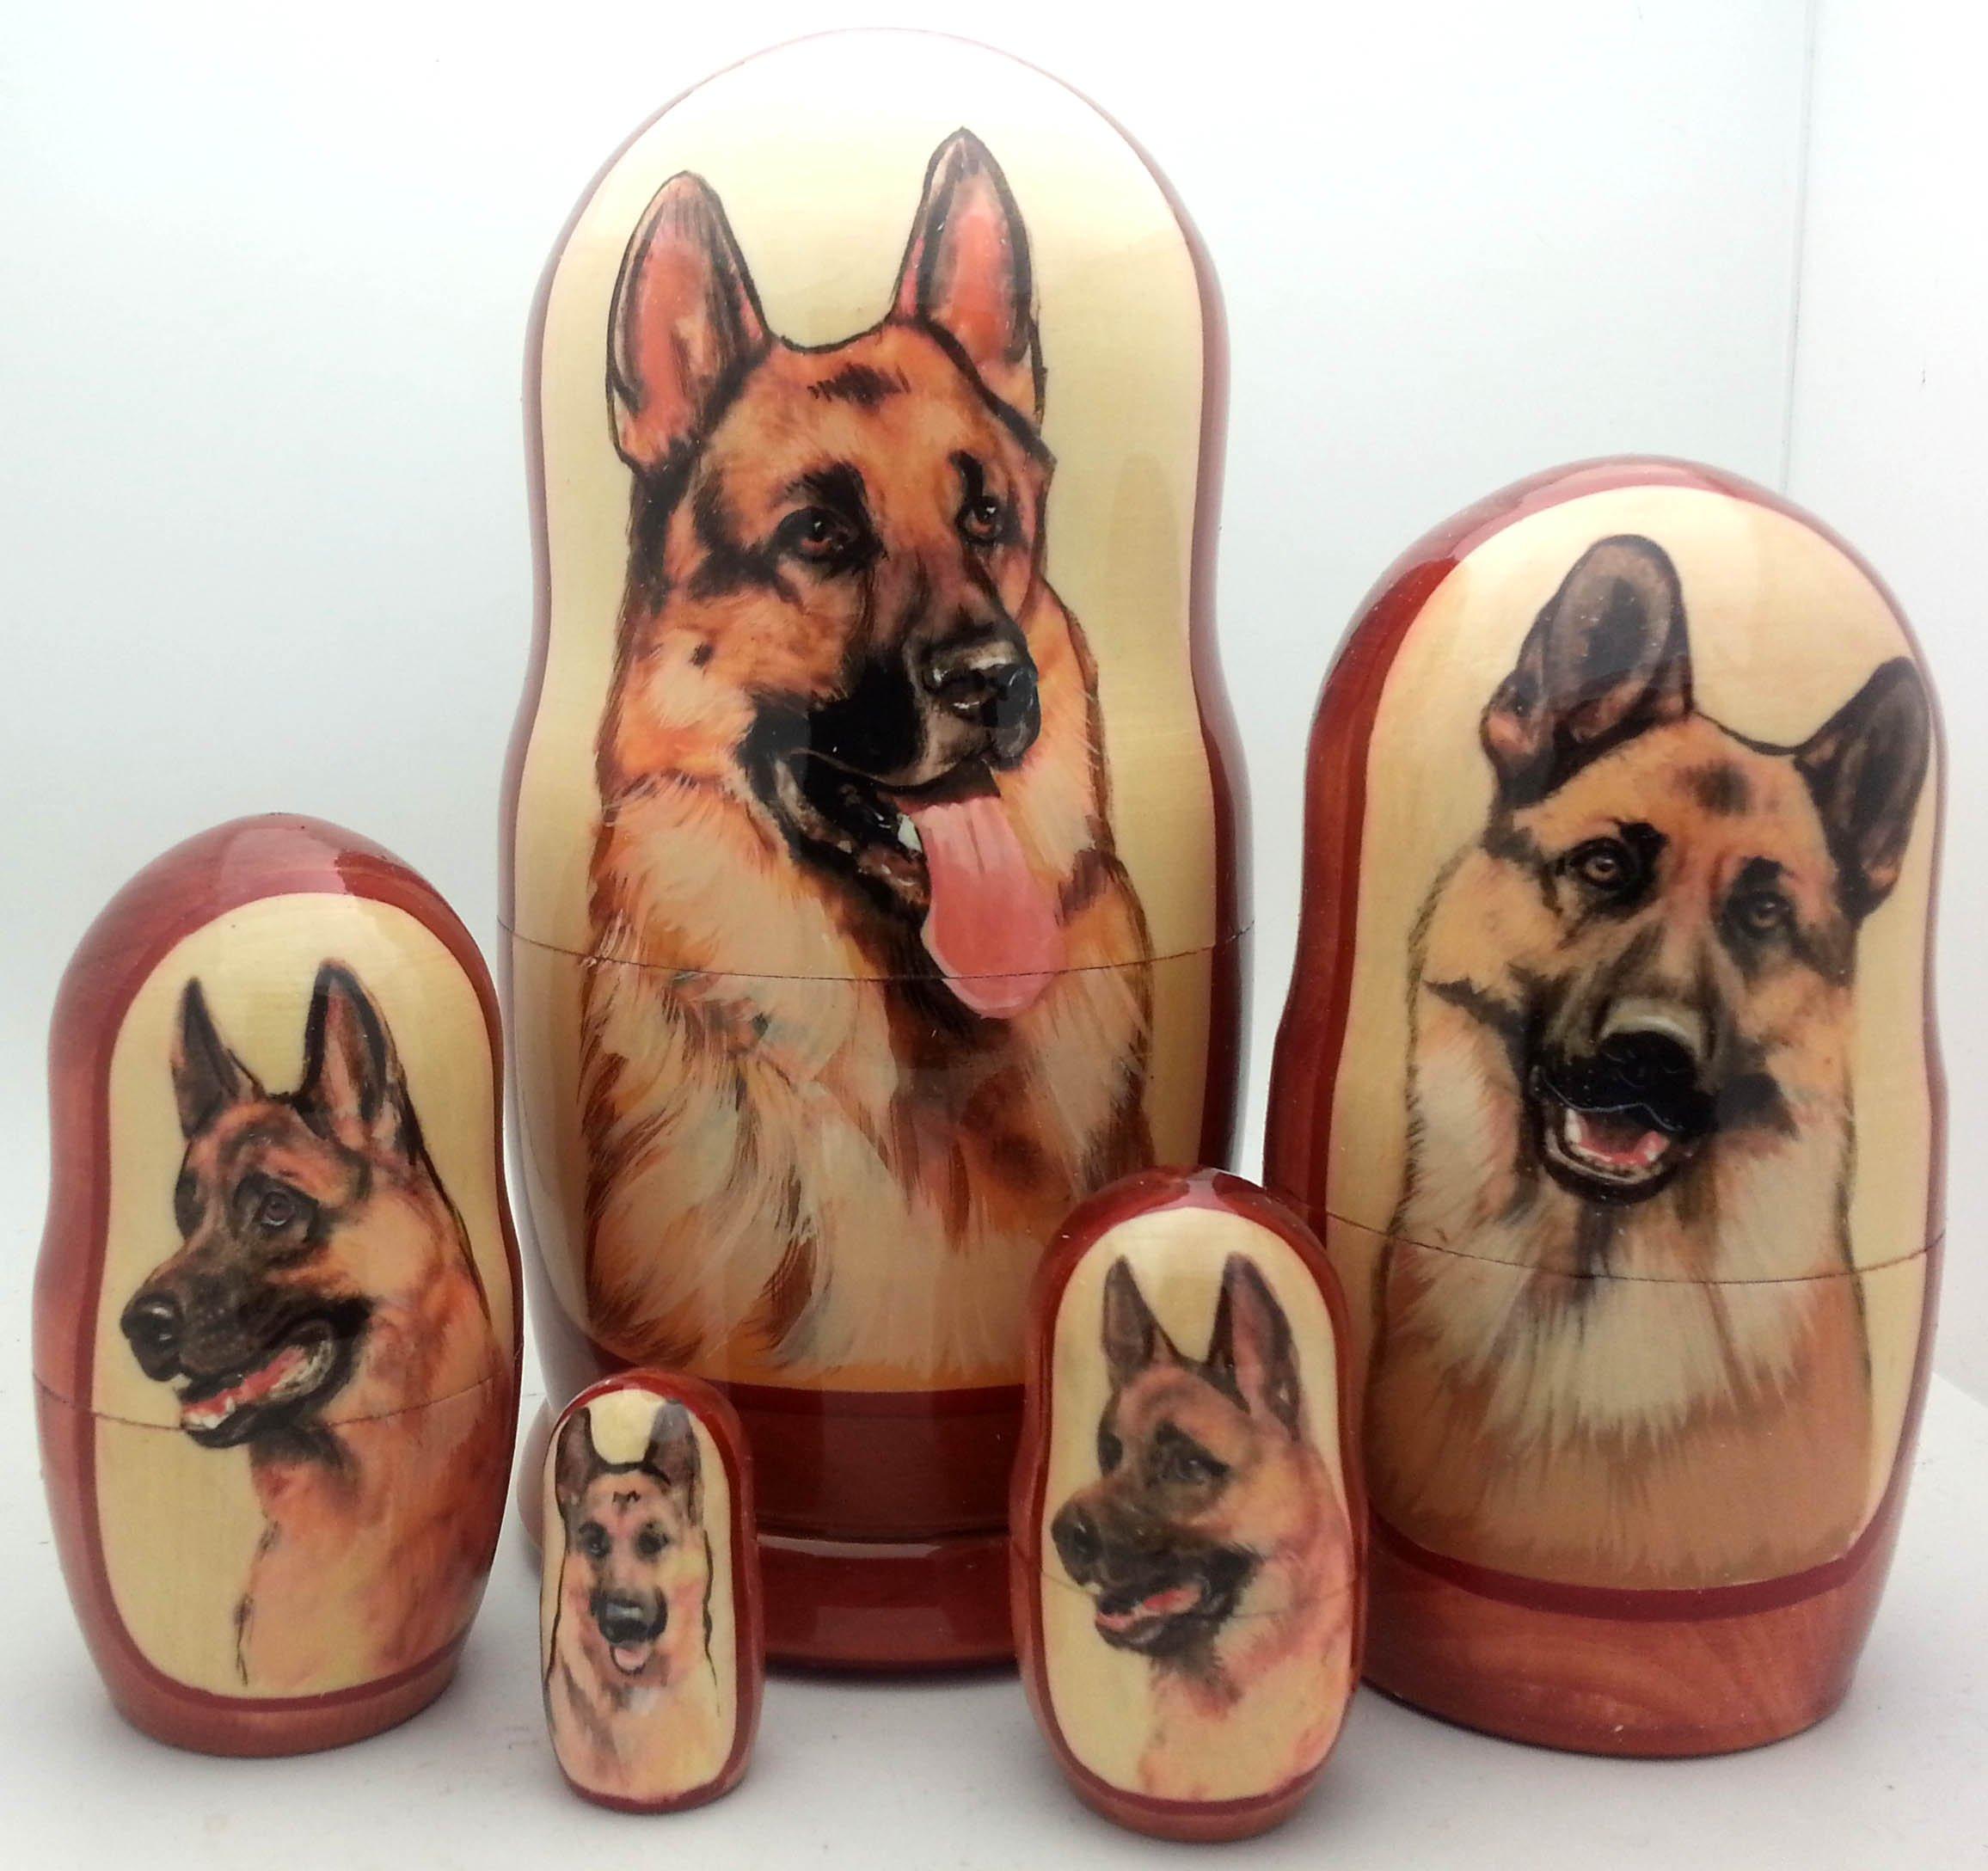 DOG German Shepherd nesting dolls Russian Hand Made 5 piece matryoshka Set 7''H